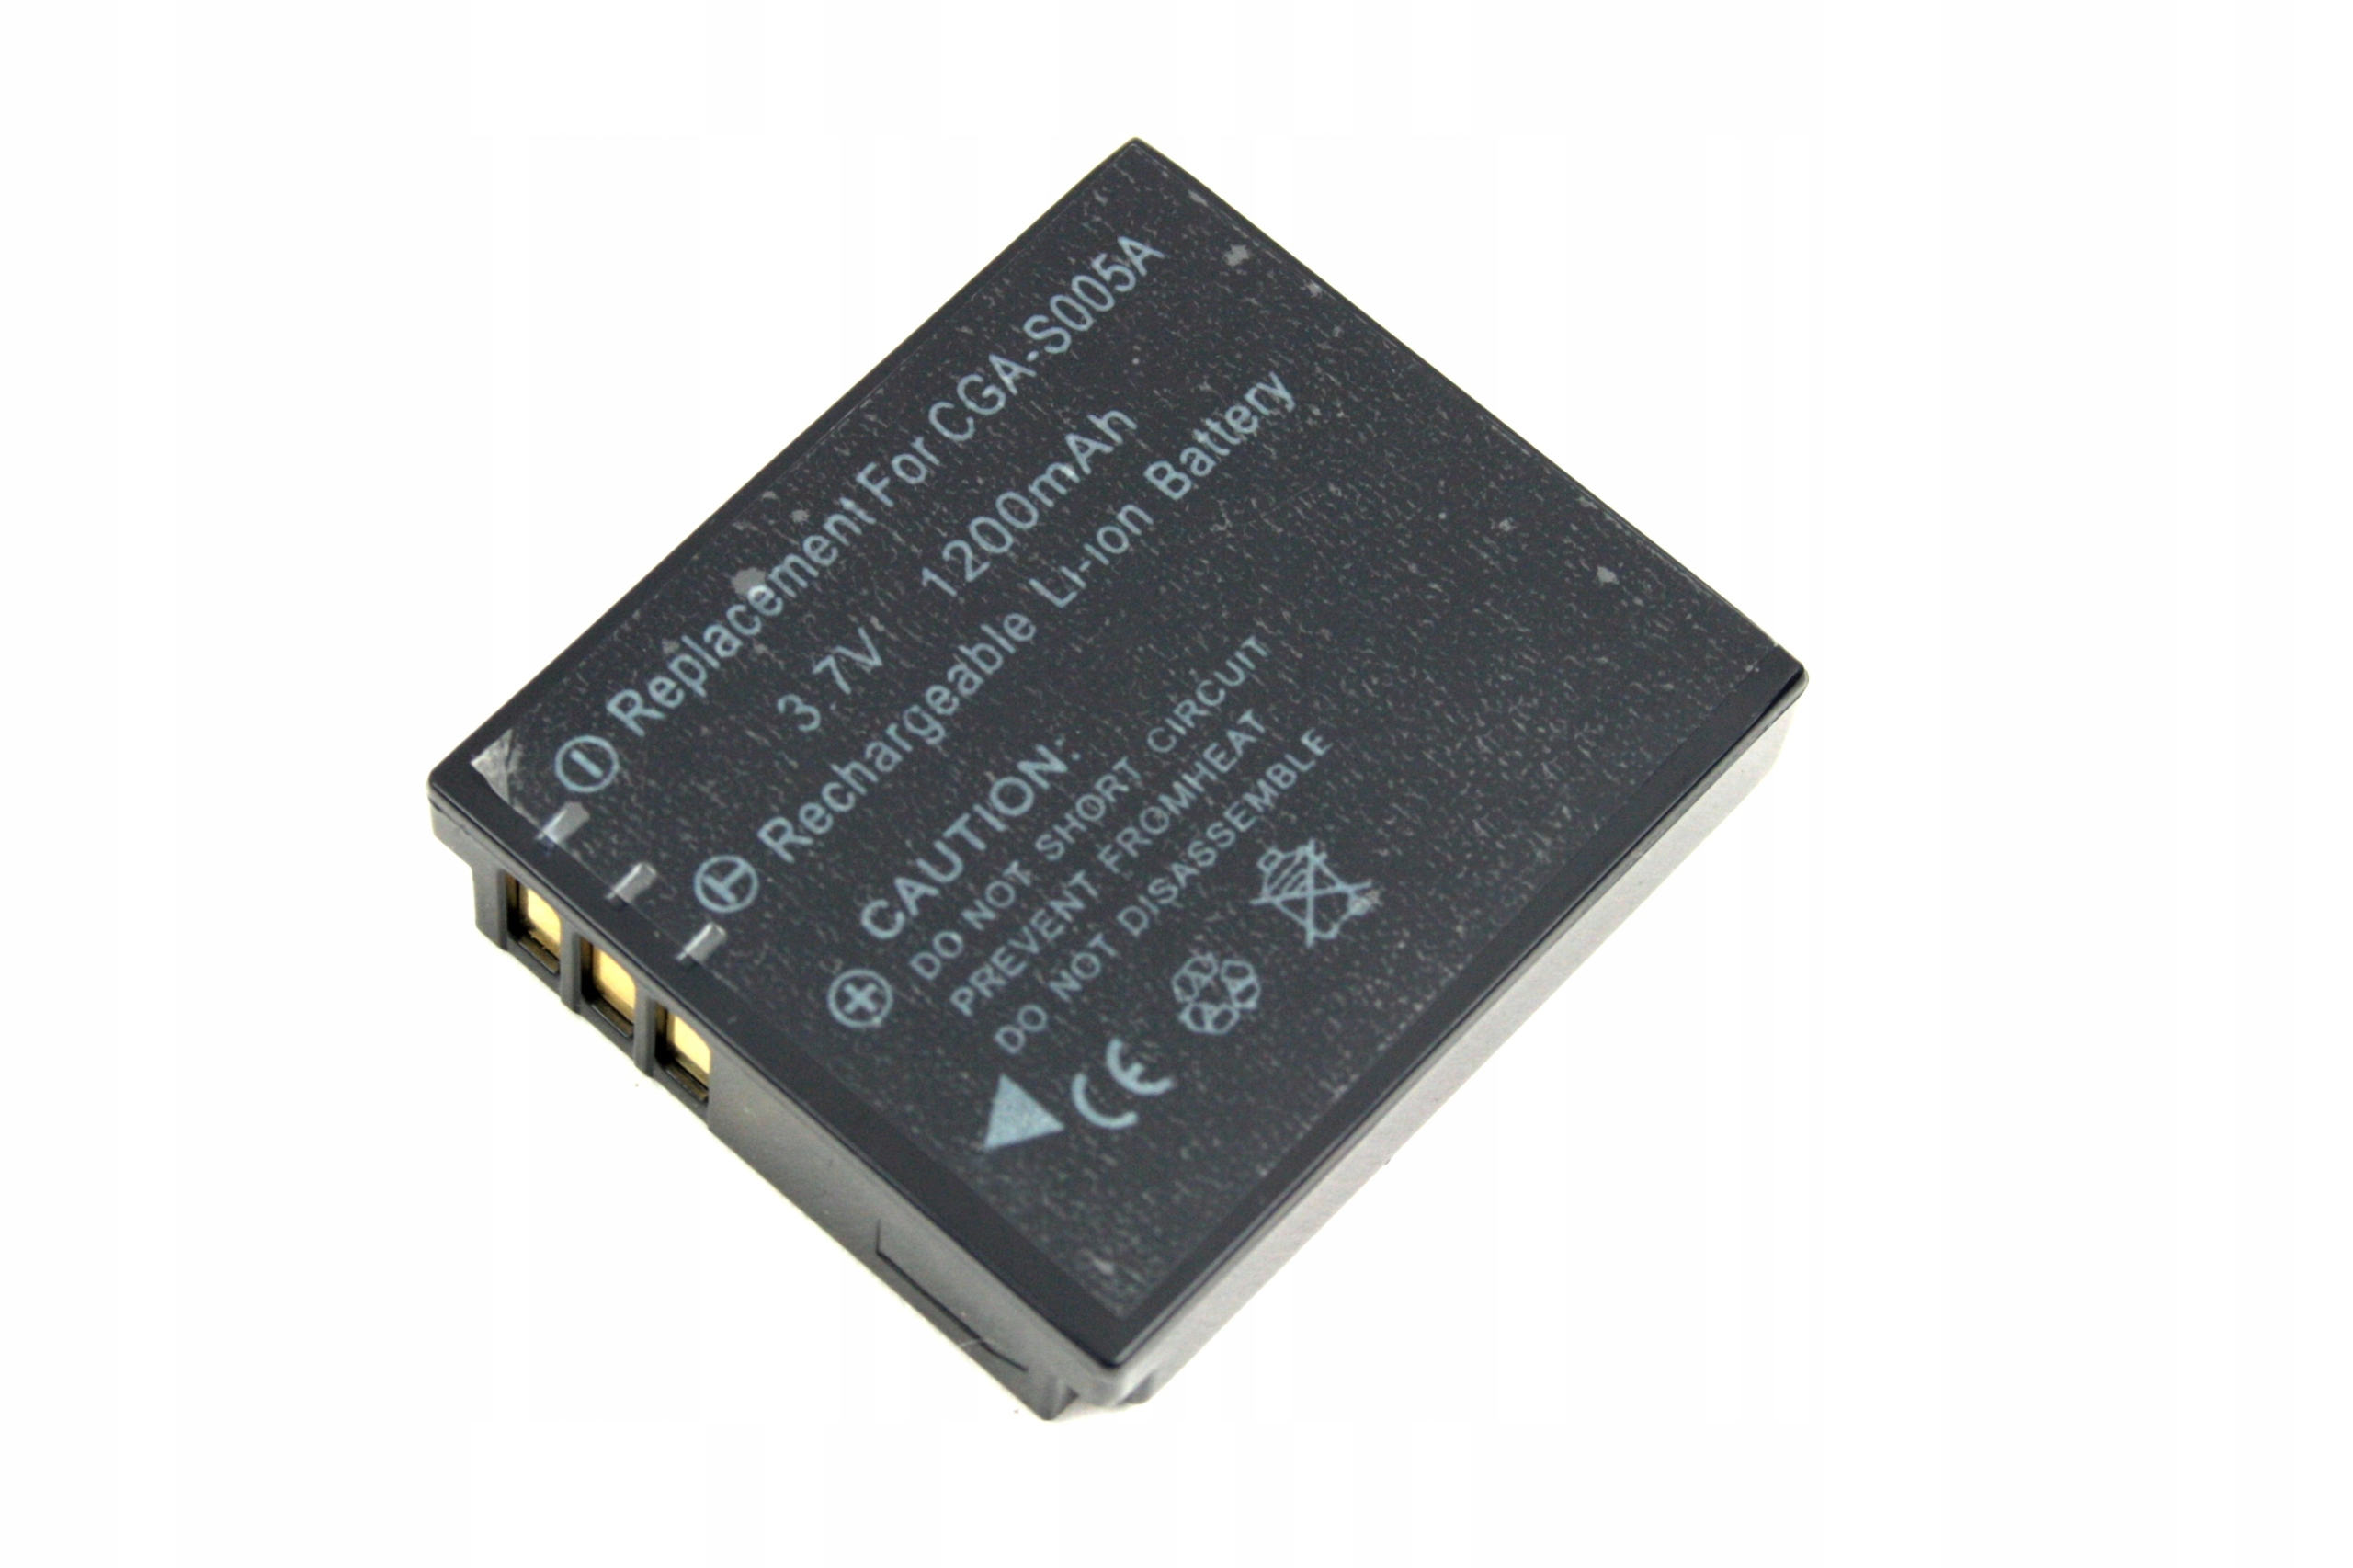 BATERIA AKUMULATOR PANASONIC CGA-S005E LUMIX DMC-FX12 FS1 - Baterie do aparatów cyfrowych